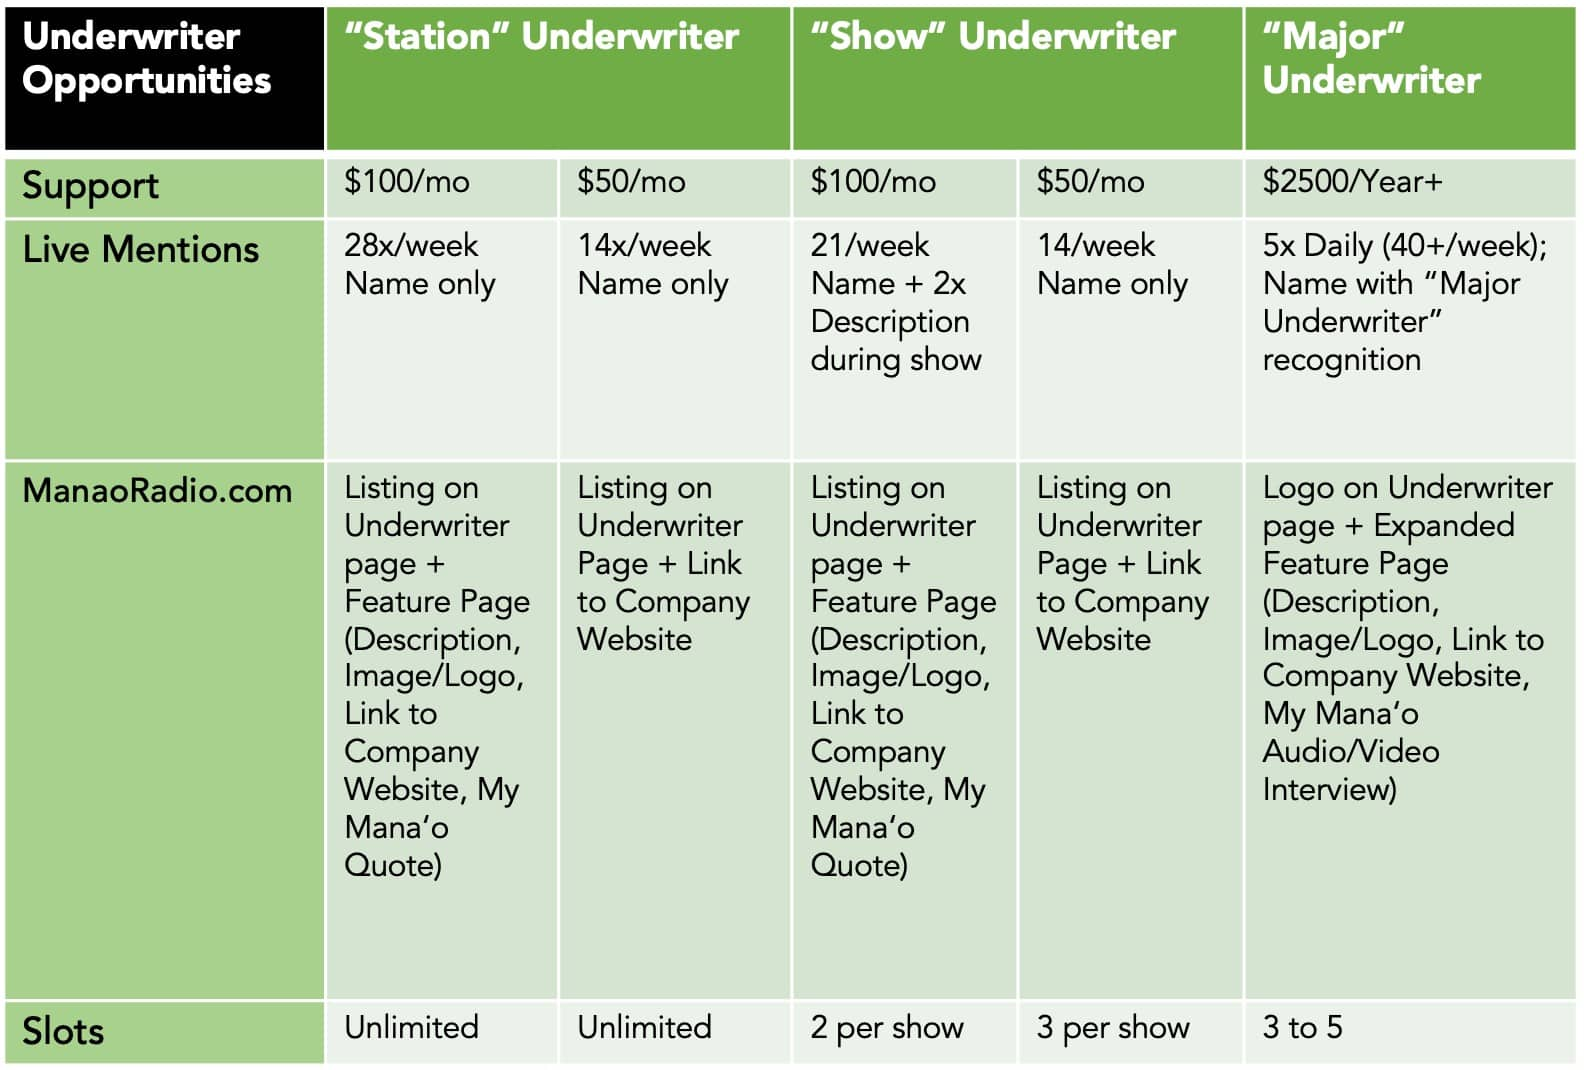 Underwriter Opportunities chart